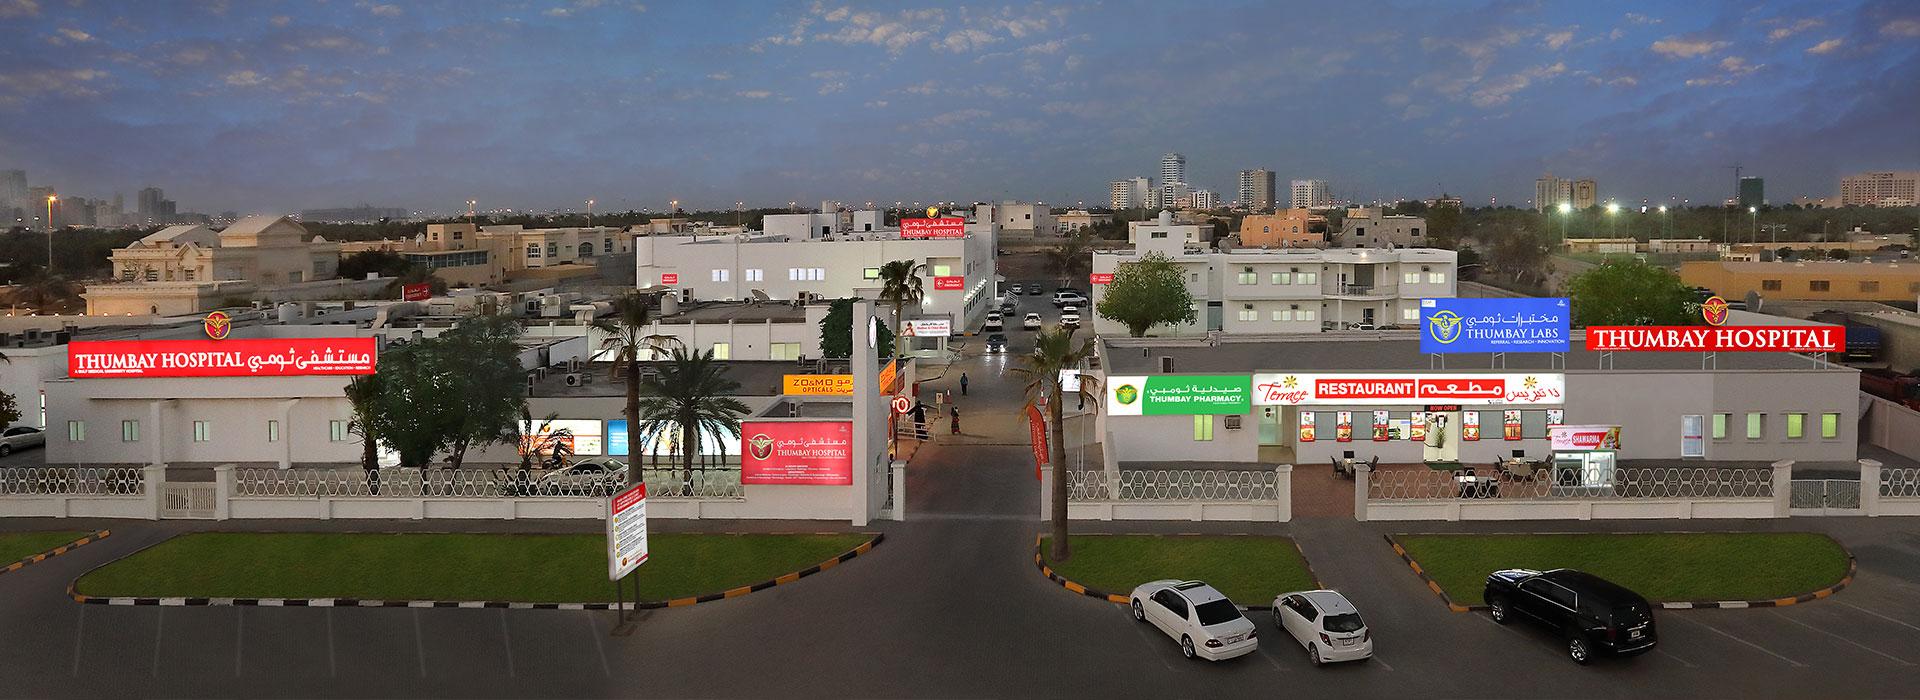 Thumbay Hospital, Fujairah